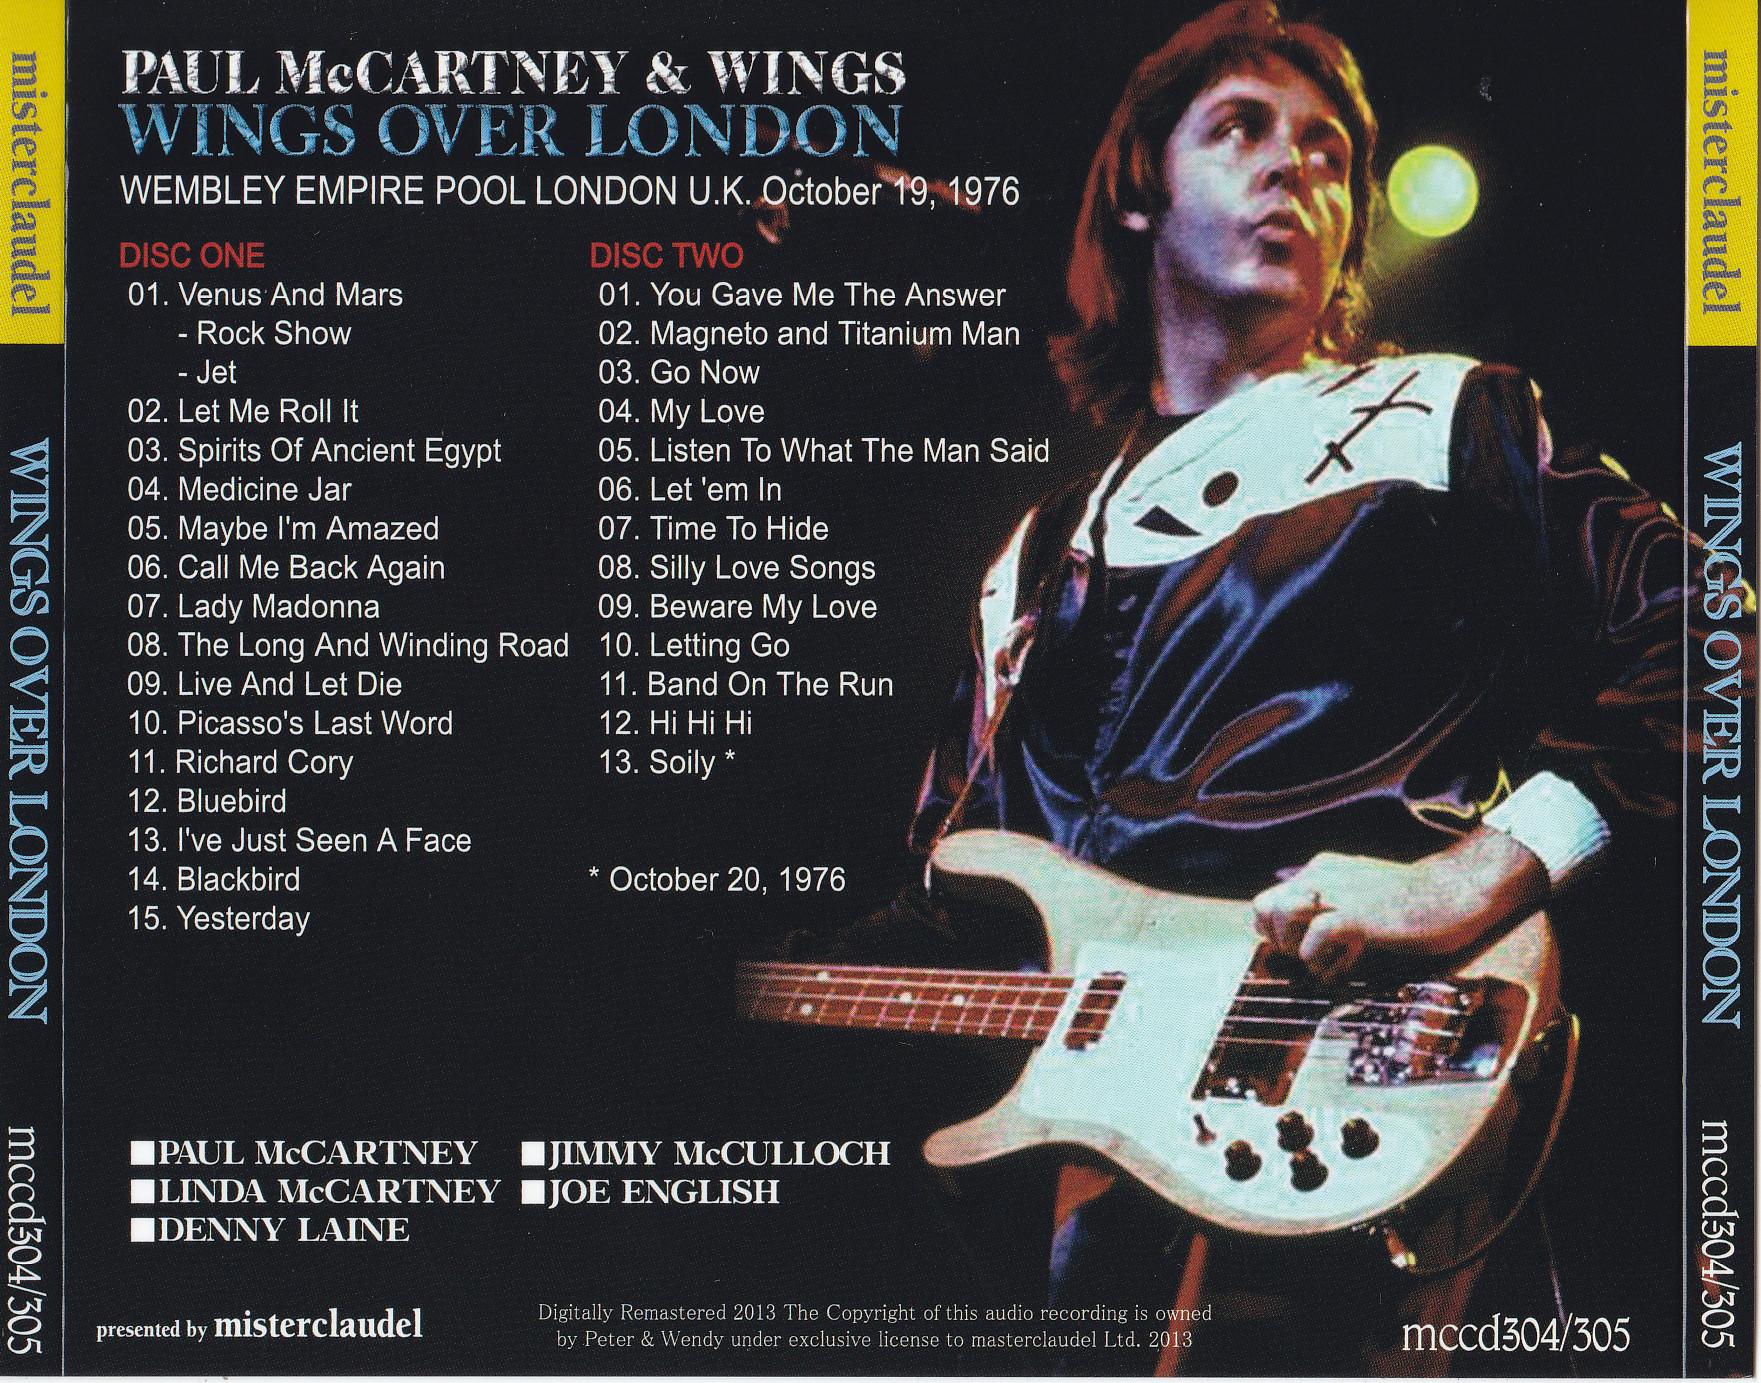 Paul McCartney & Wings / Wings Over London 1976 / 2CD WX OBI